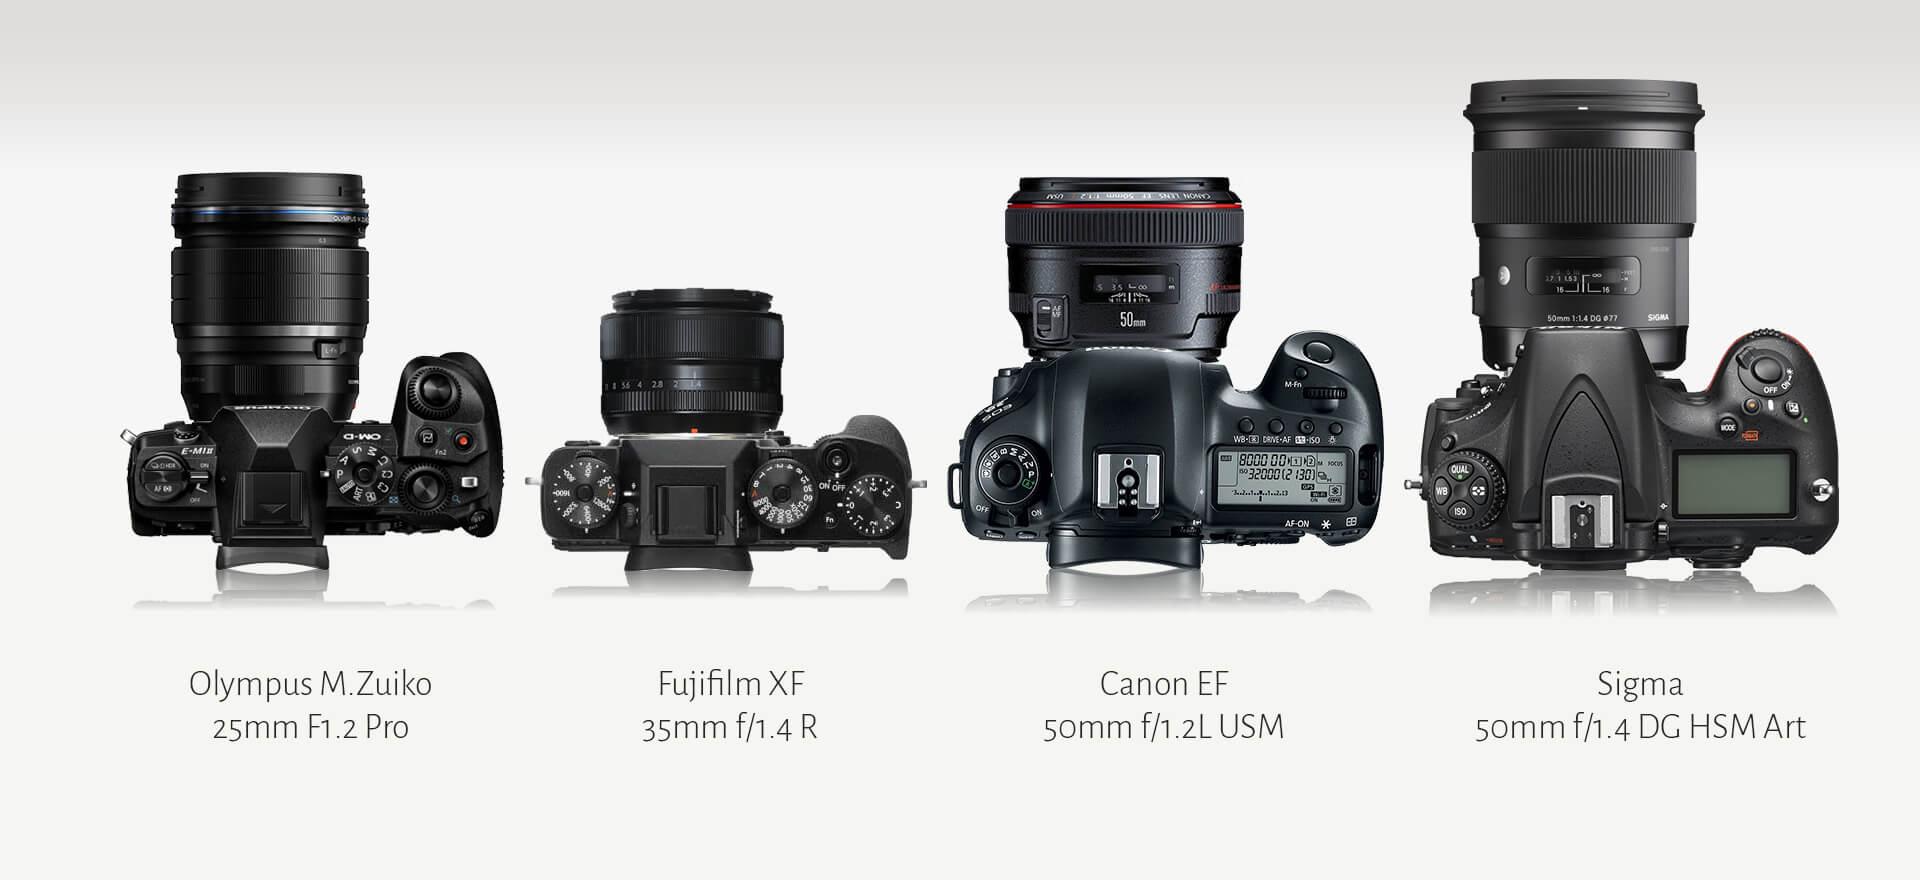 Olympus 25mm f/1.2 - Fujifilm 35mm f/1.4 - Canon 50mm f/1.2 - Sigma 50mm f/1.4